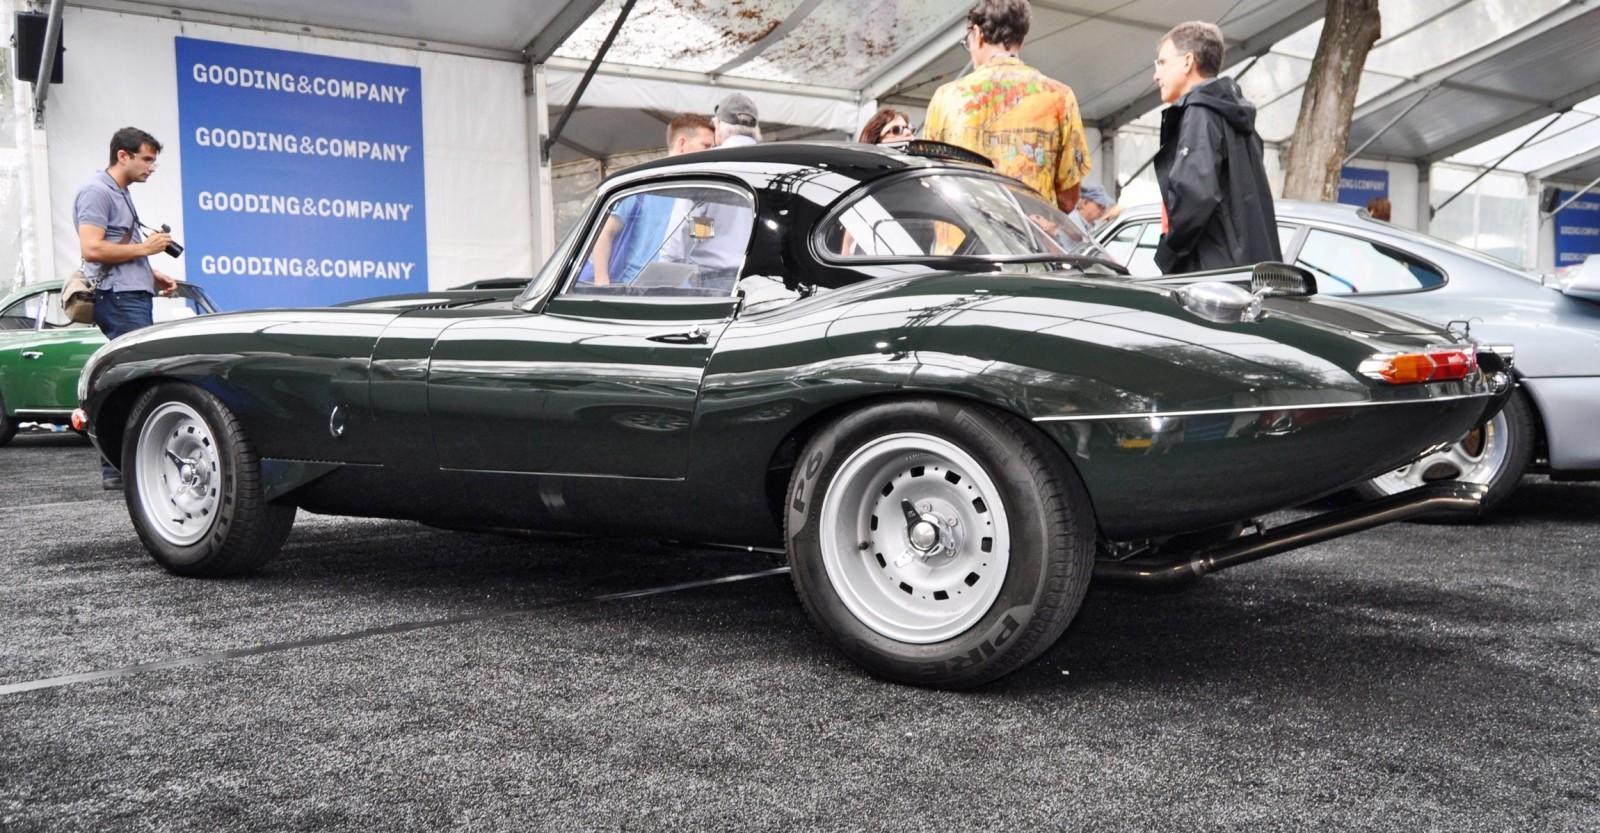 Une jaguar sachant freiner... - Page 6 1961-Jaguar-E-Type-Series-I-Lightweight-Replica-7-1600x833